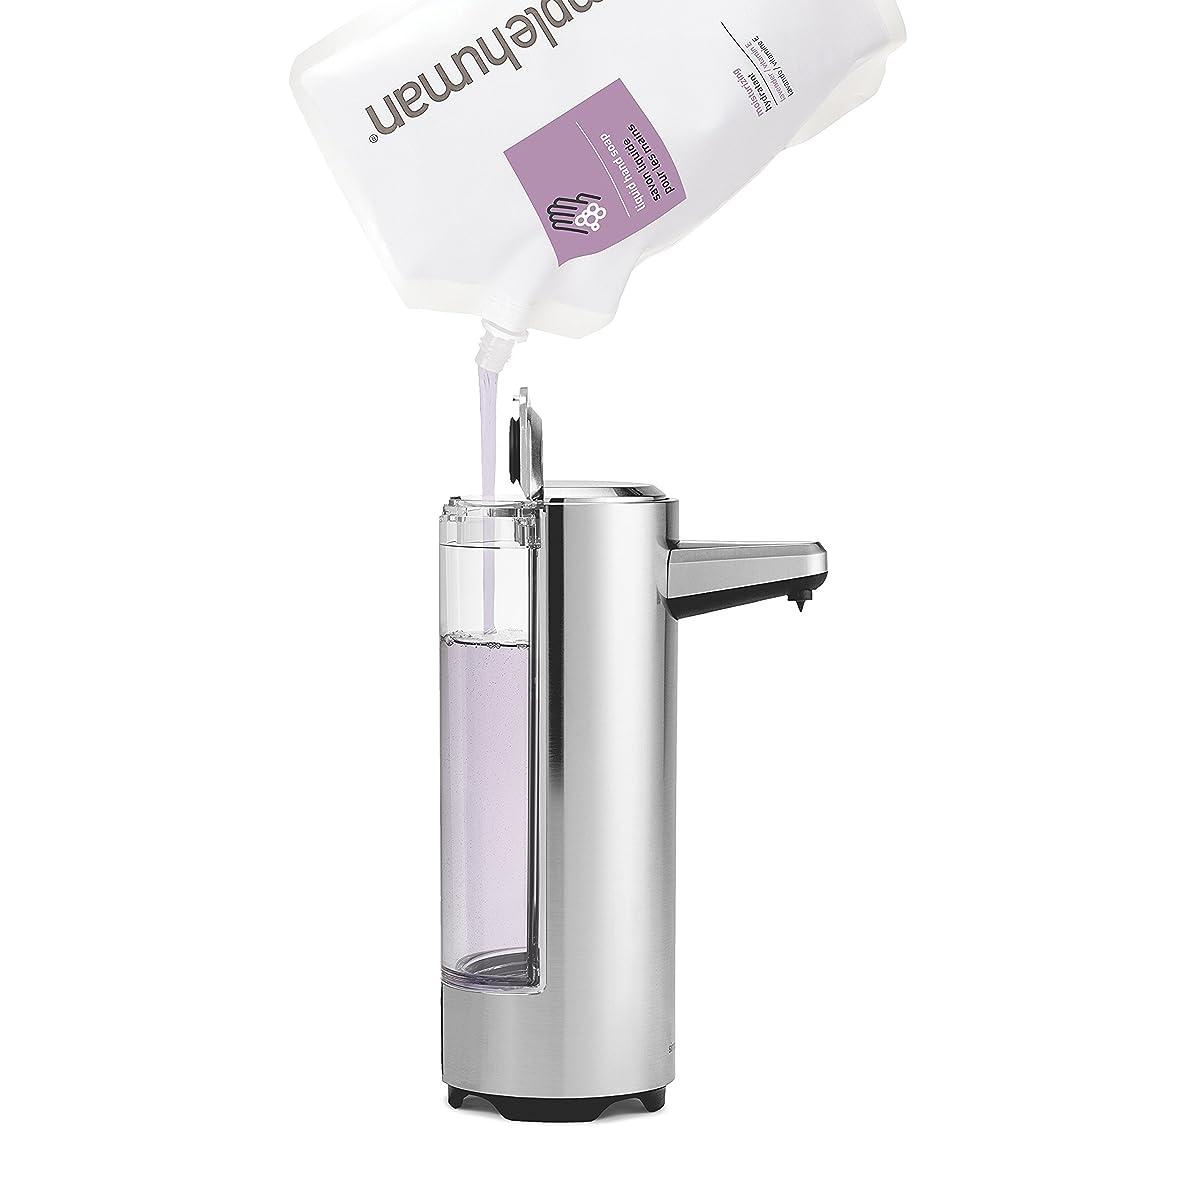 simplehuman 8 oz. Sensor Pump with Soap Sample, Brushed Nickel